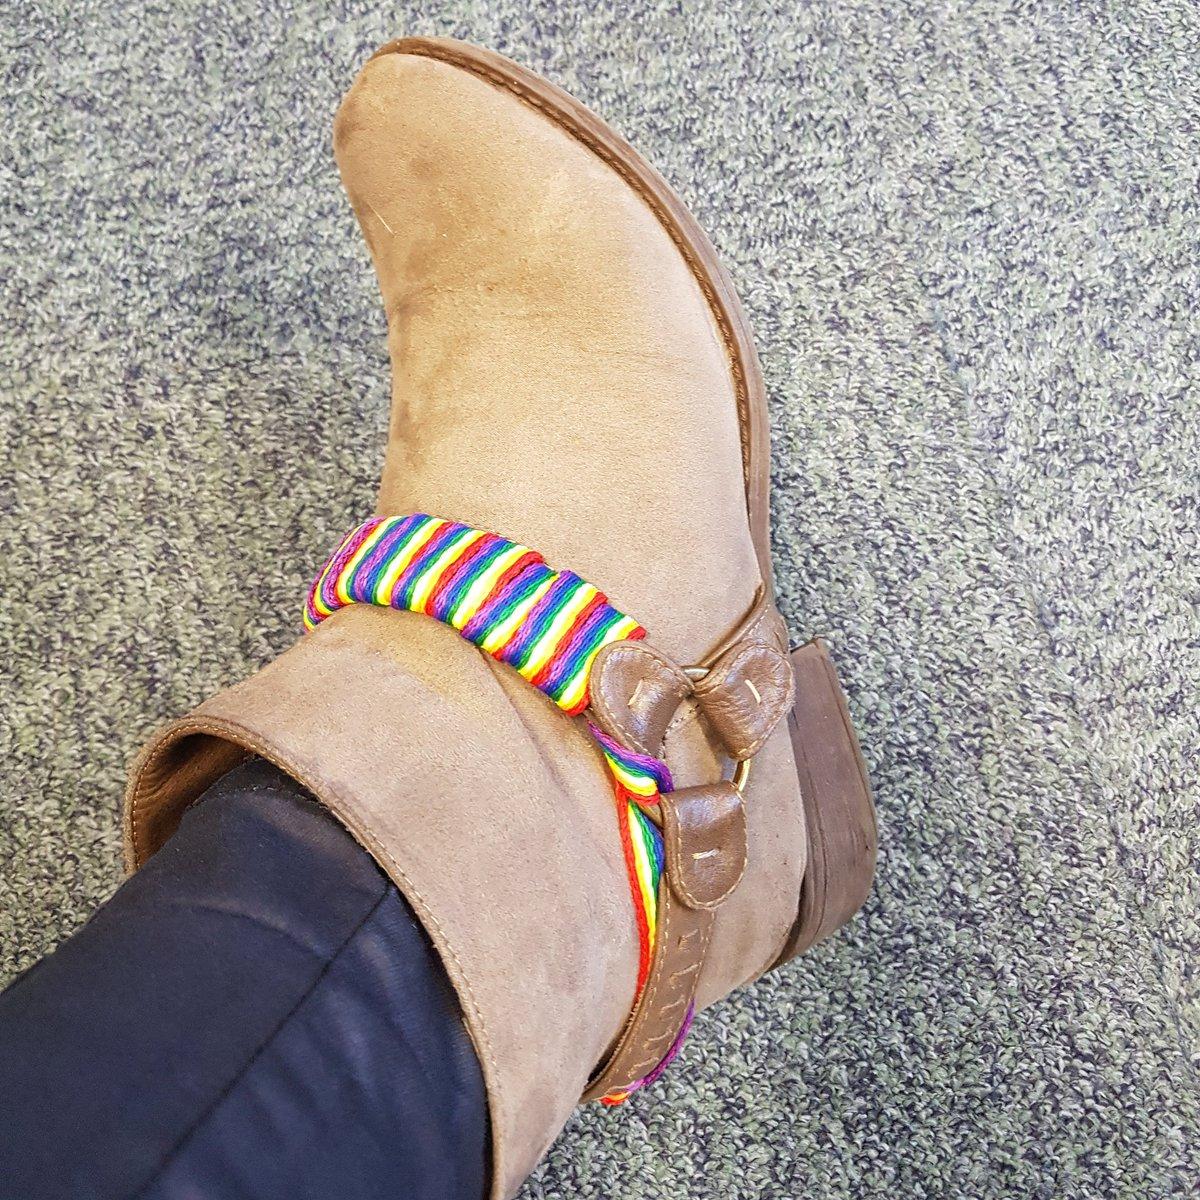 Admit it ... We rock the laces #RainbowL...